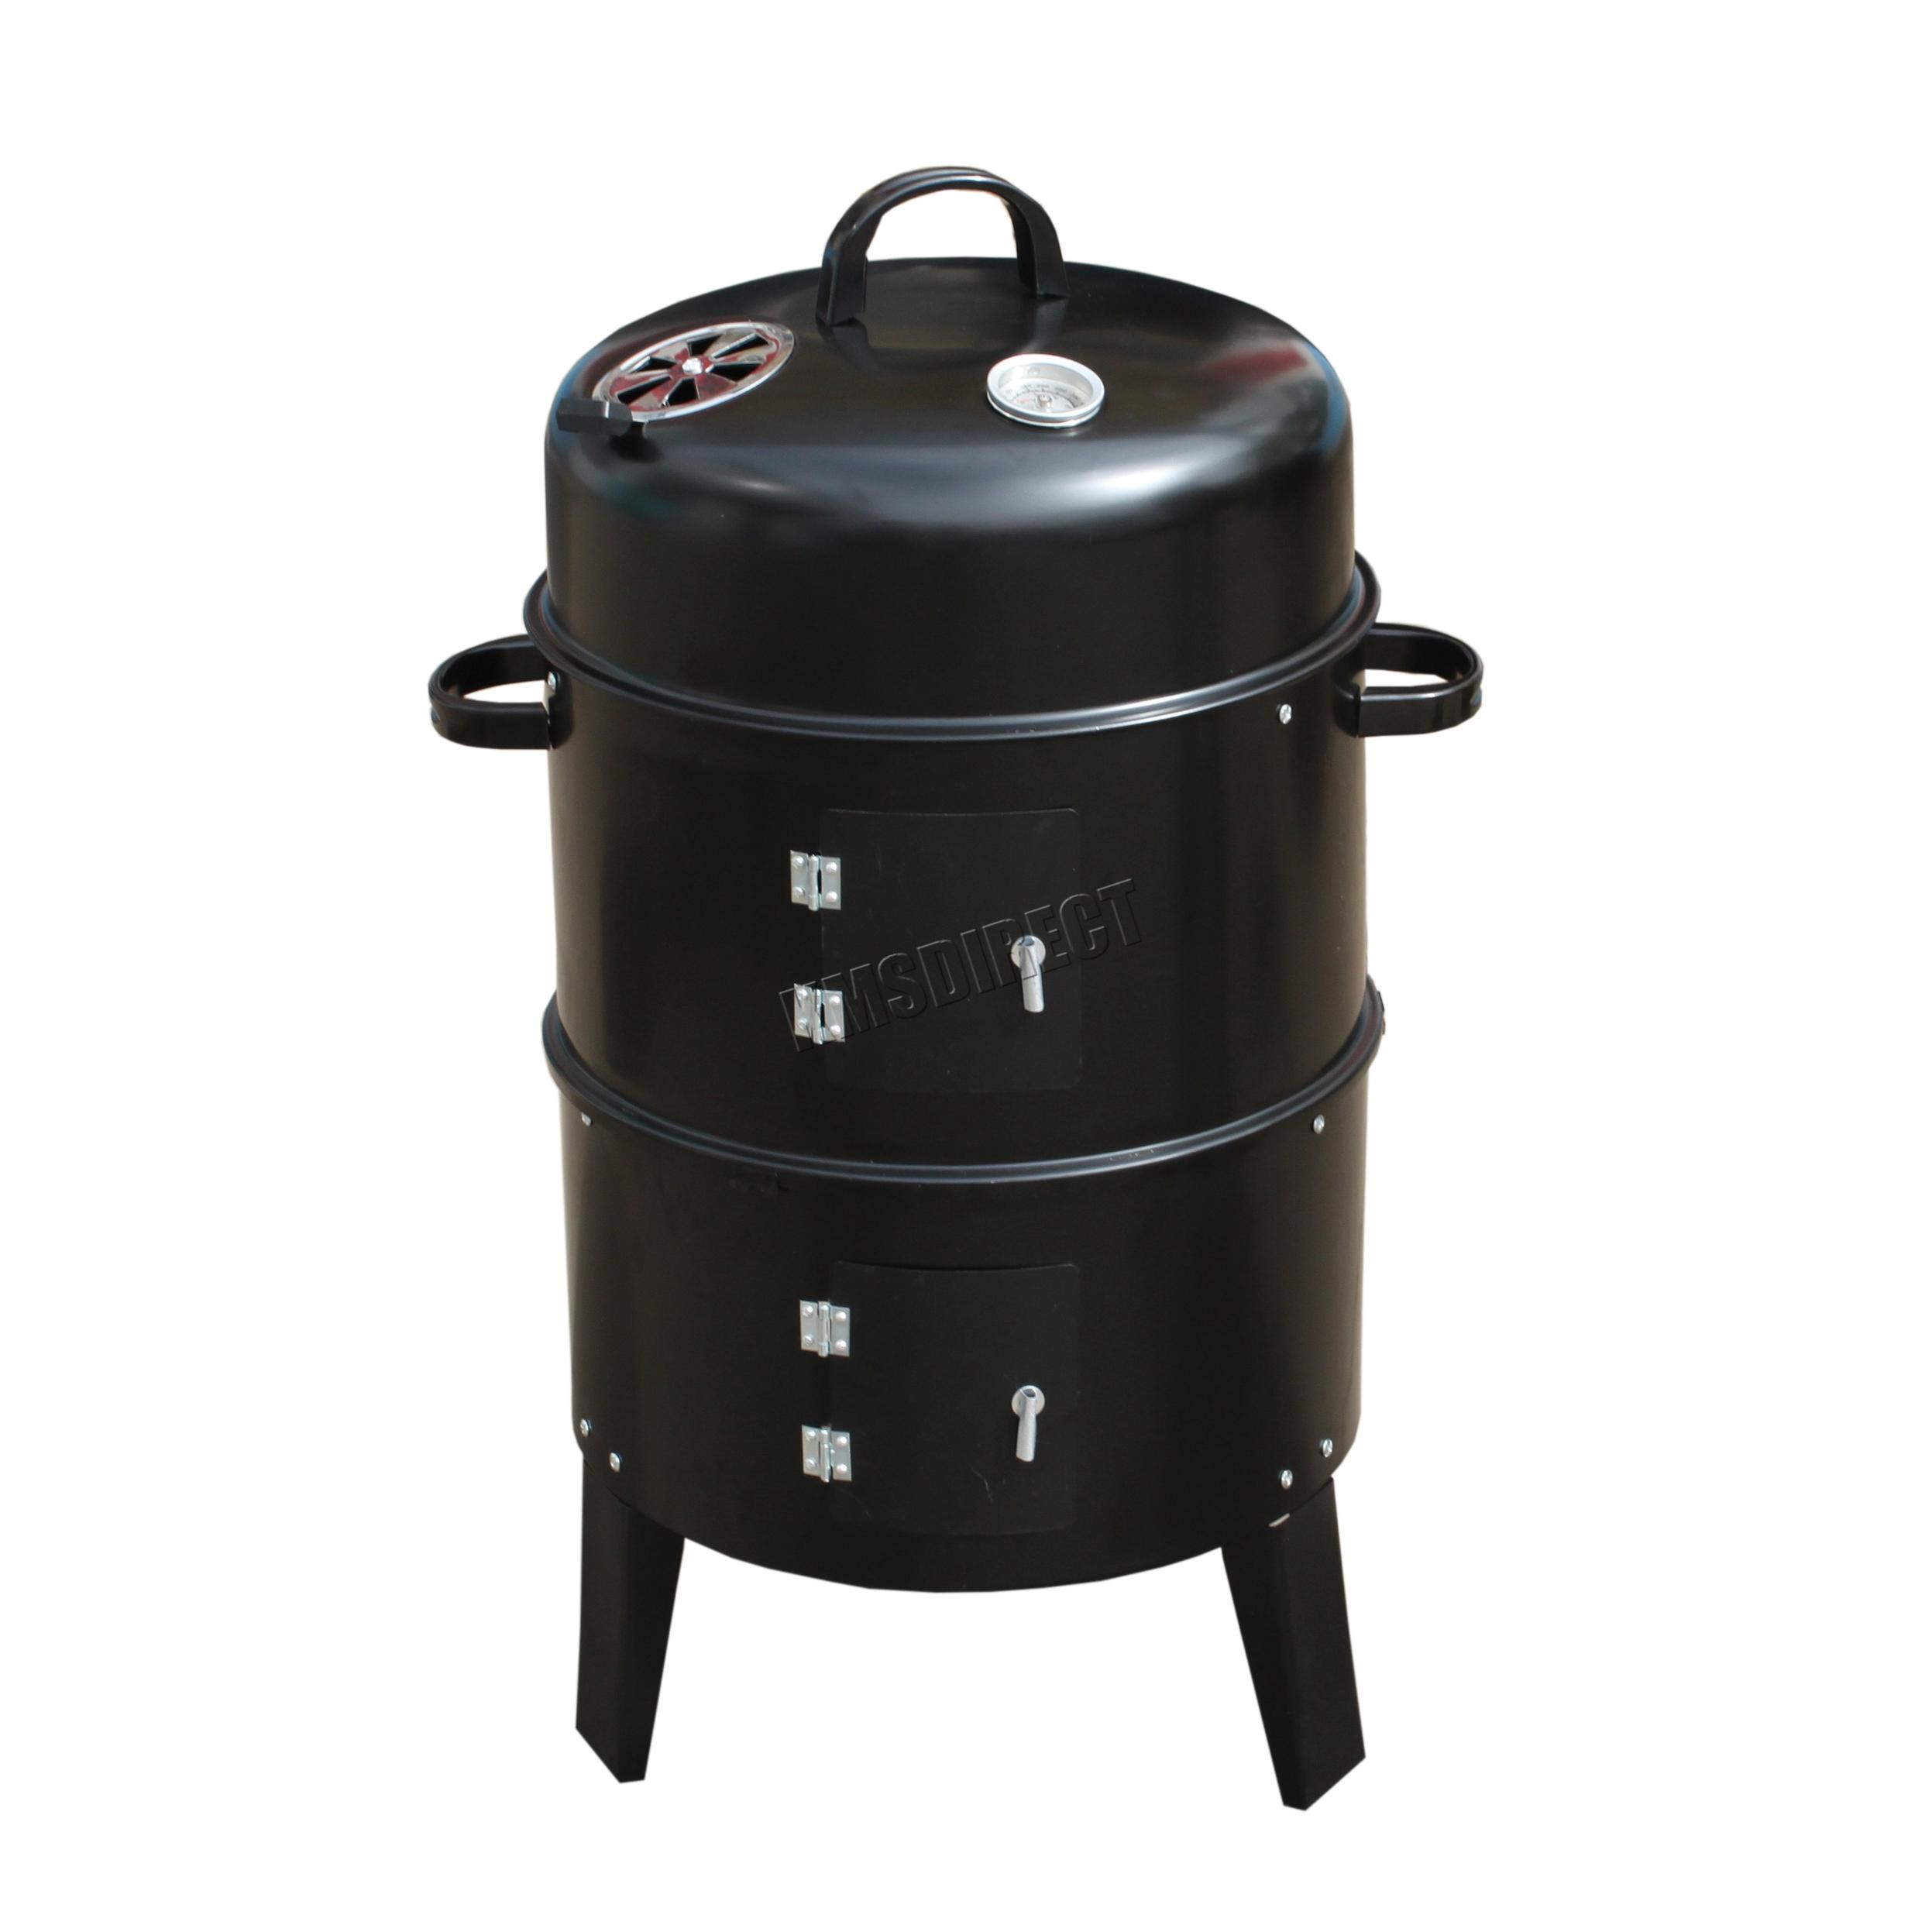 Foxhunter Black Bbq Charcoal Grill Barbecue Smoker Garden